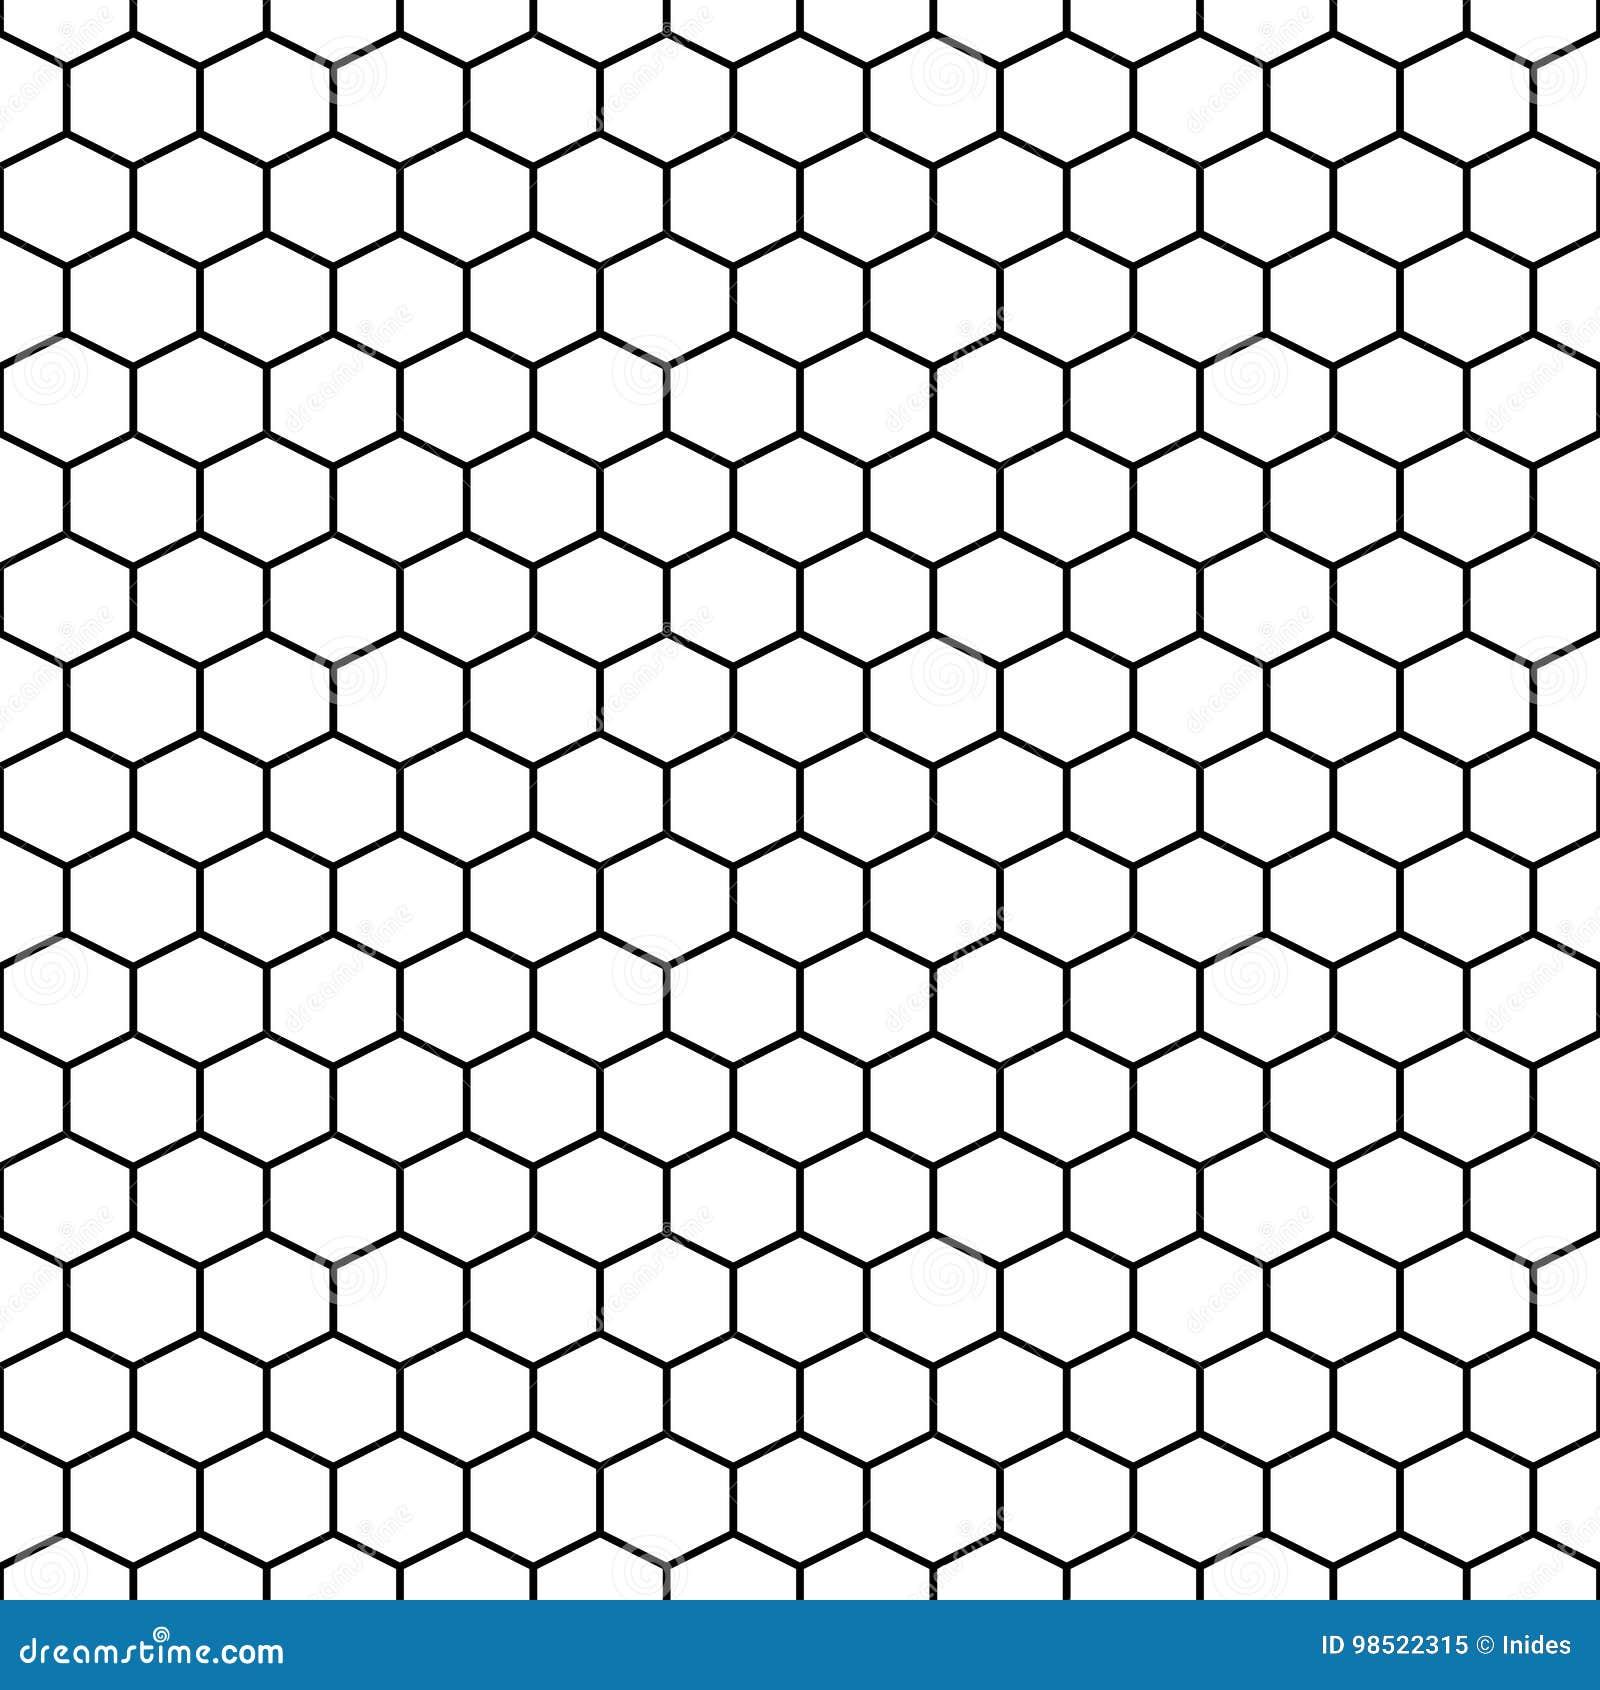 Hexagon Grid Cells Vector Seamless Pattern  Stock Vector